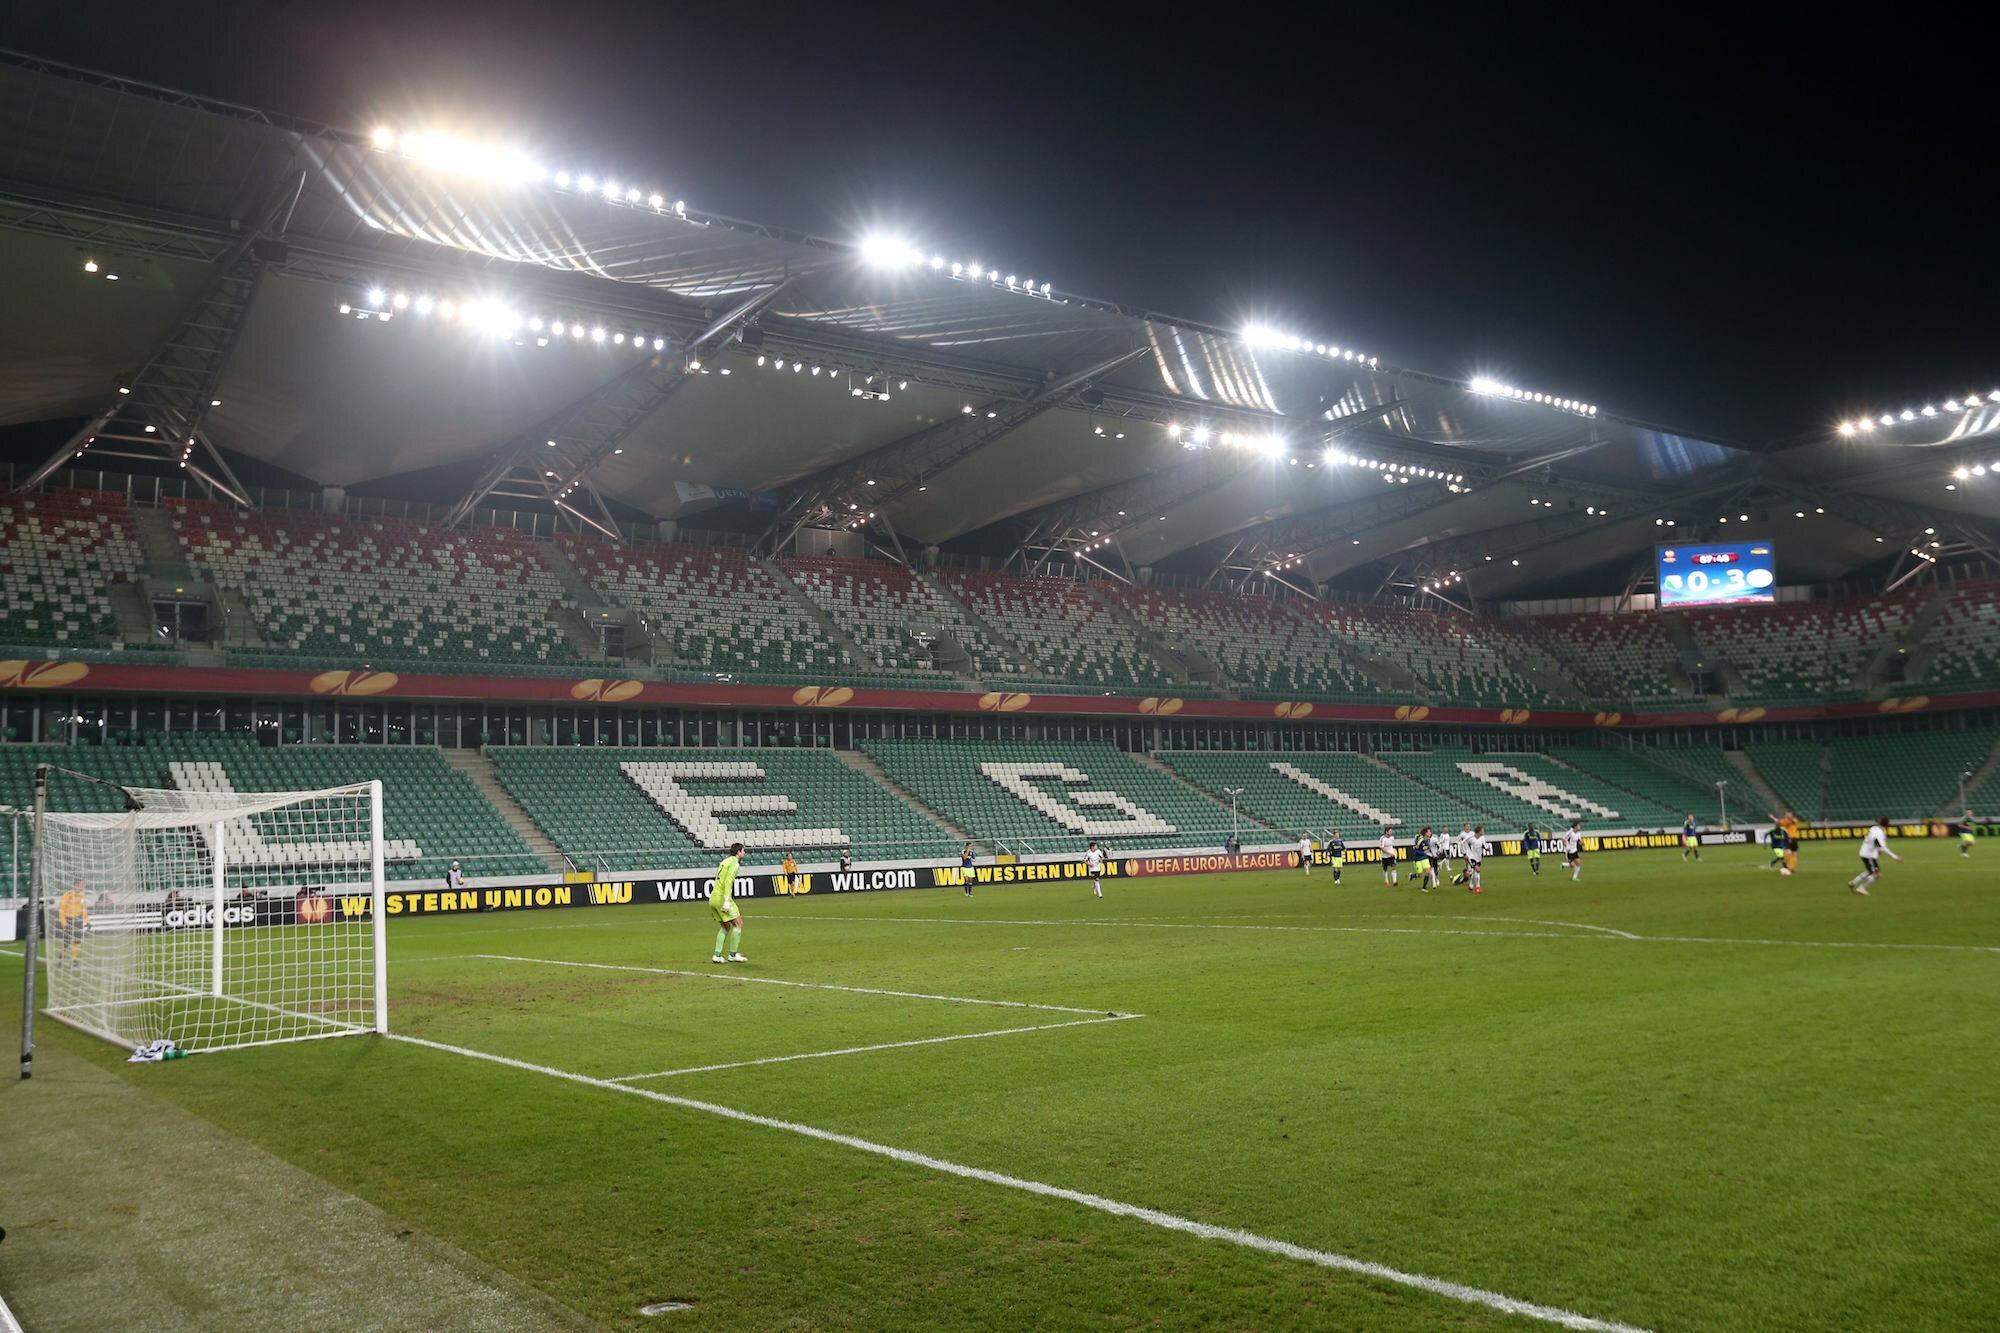 Kadr z meczu Legia - Ajax w 2015 roku